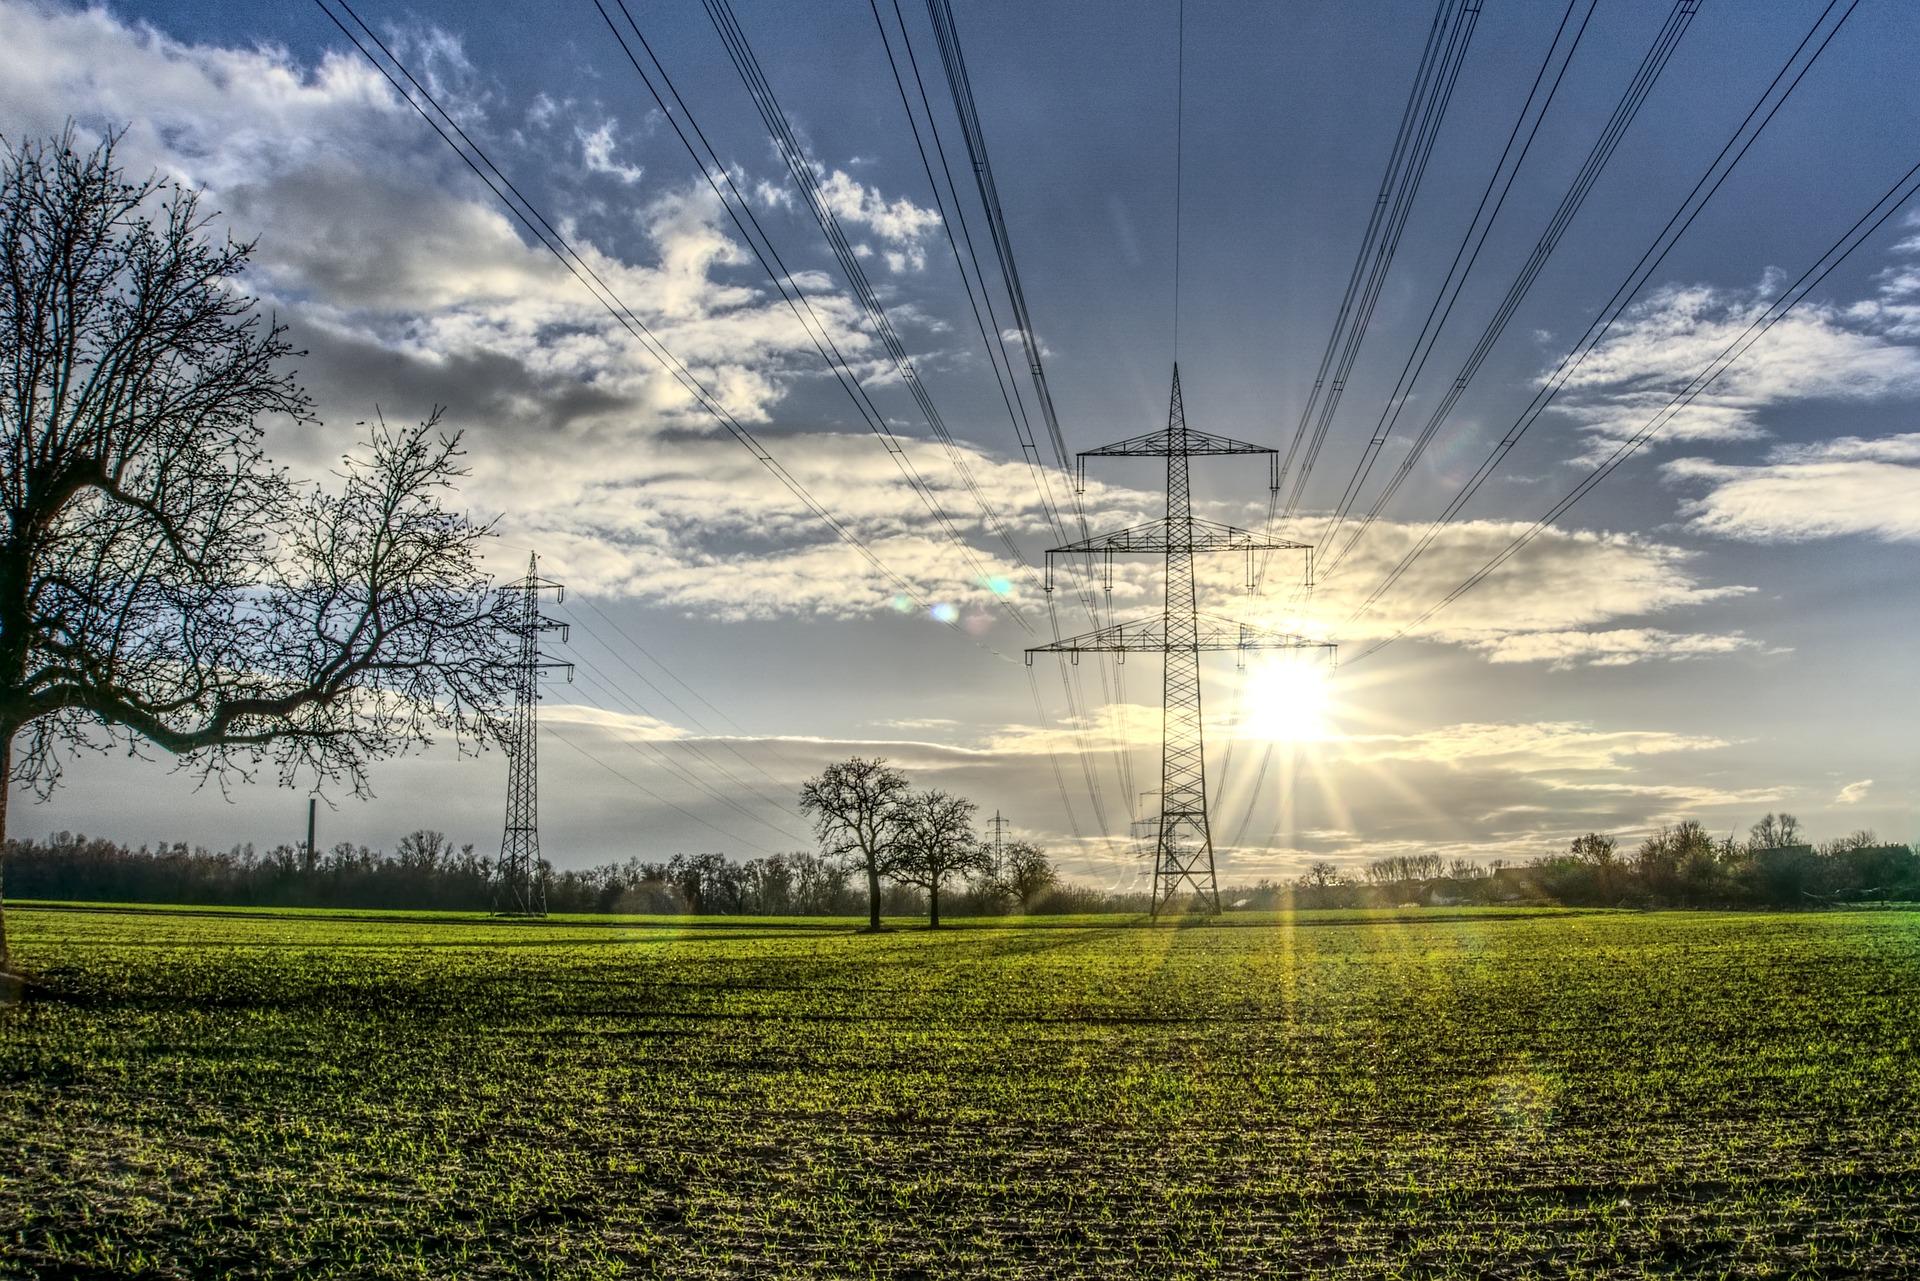 power-line-3878176_1920